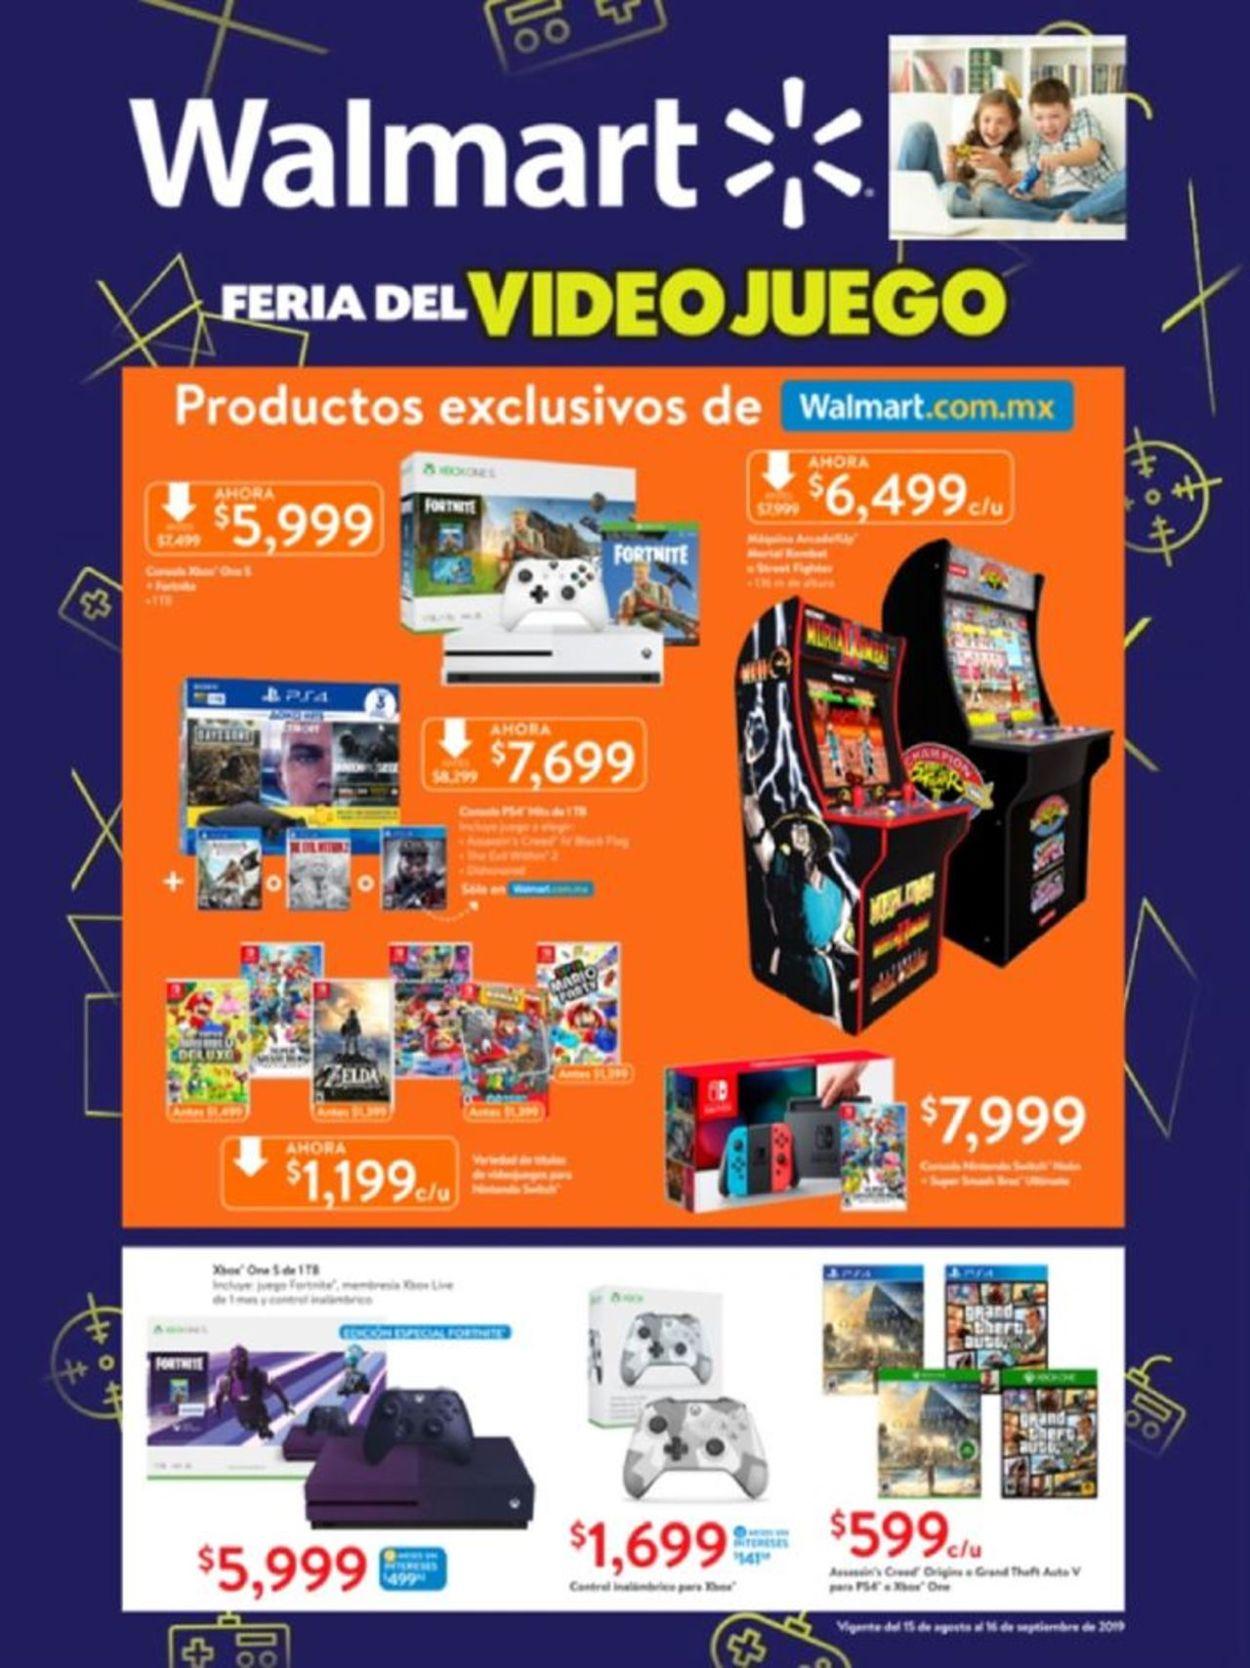 Walmart Folleto - 15.08-16.09.2019